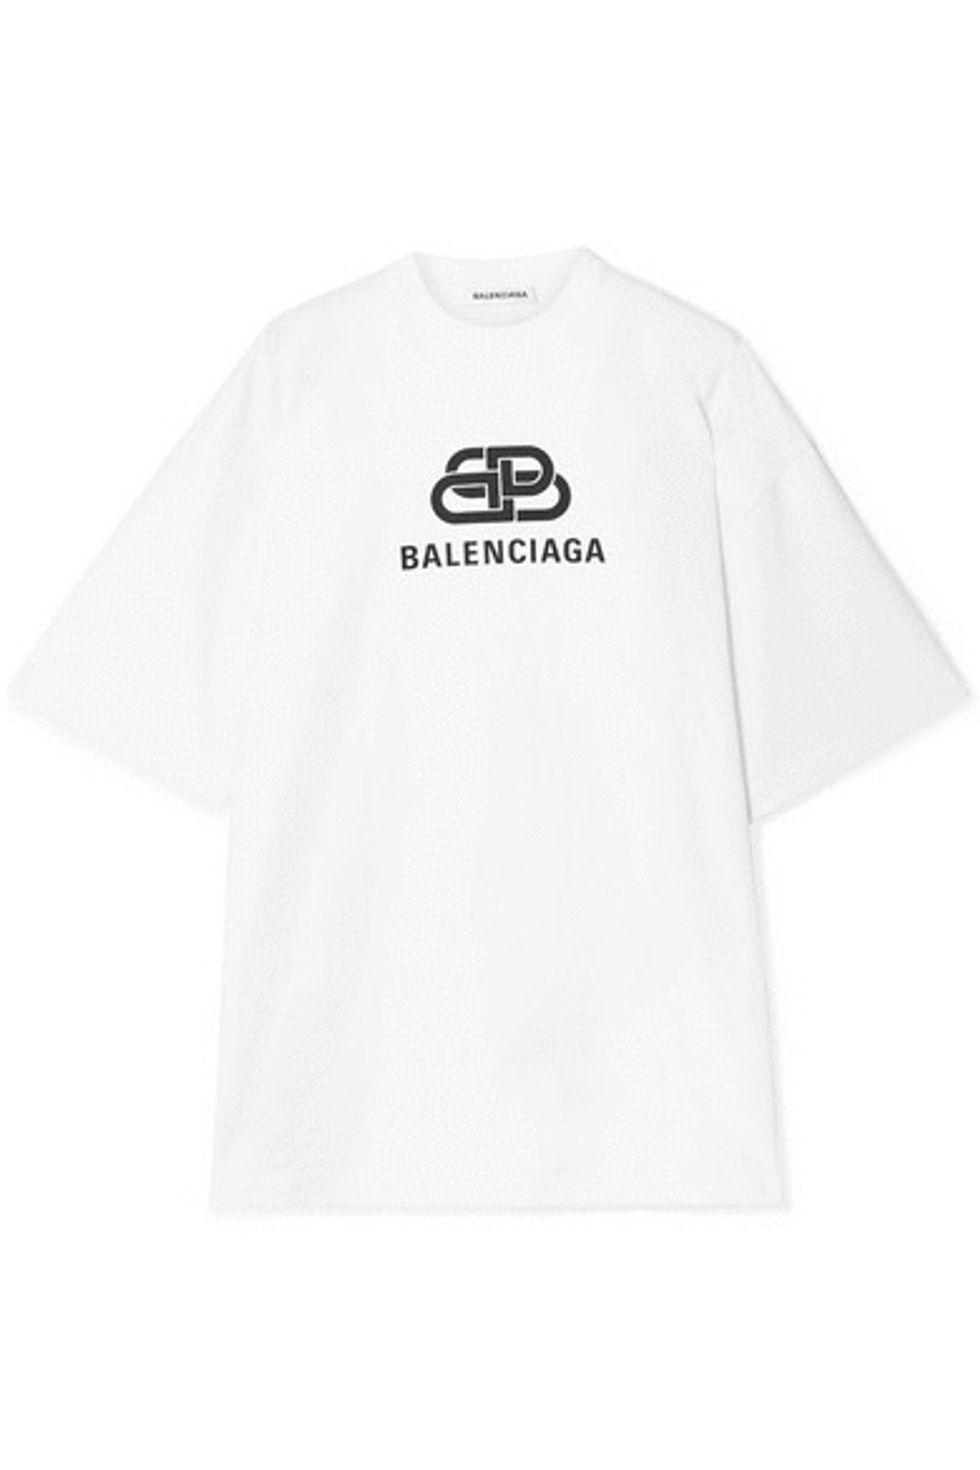 camisetas viralizar look instagram BALENCIAGA